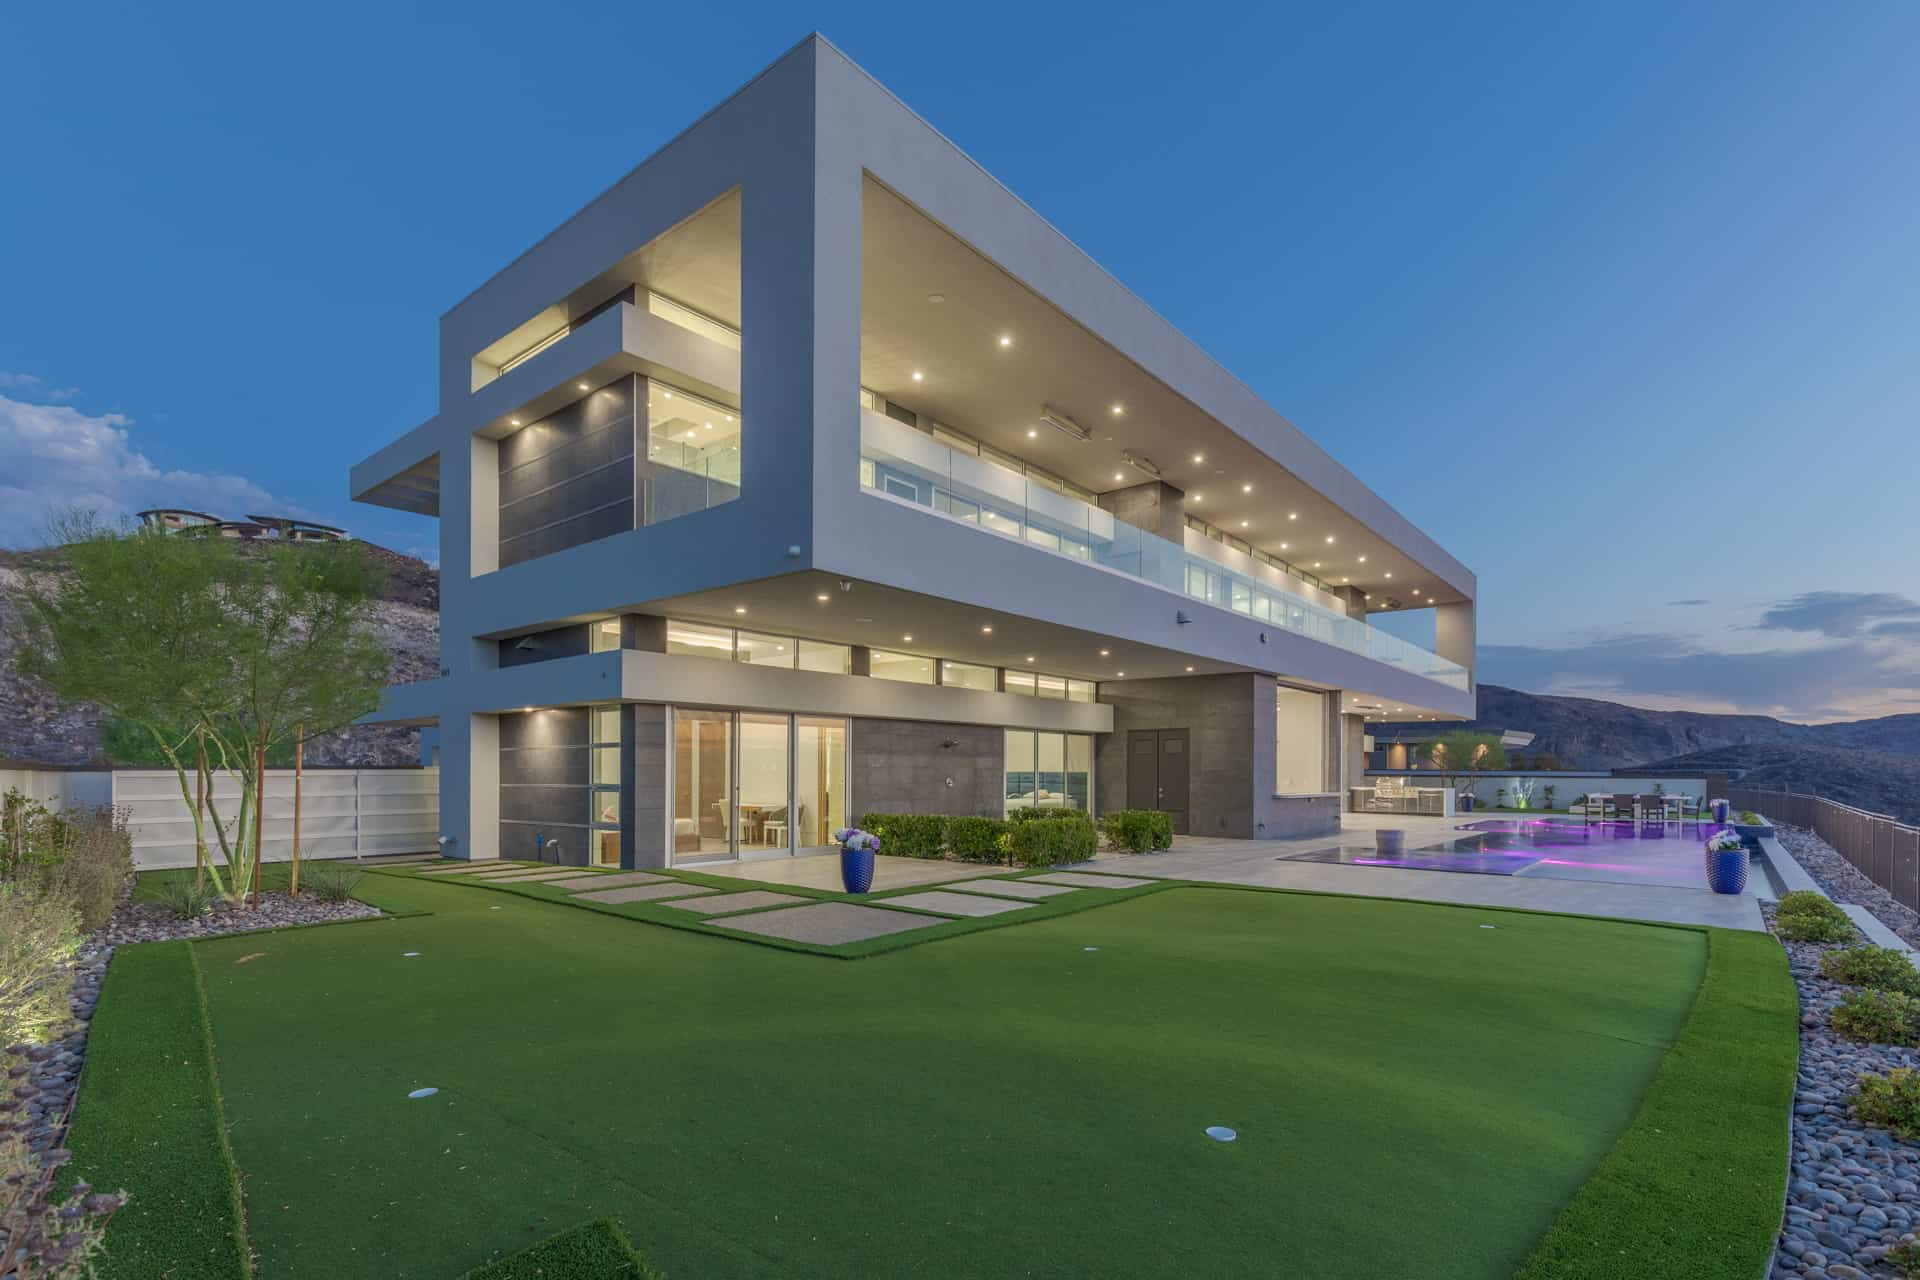 las-vegas-luxry-real-estate-realtor-rob-jensen-company-5-rockstream-drive-ascaya082